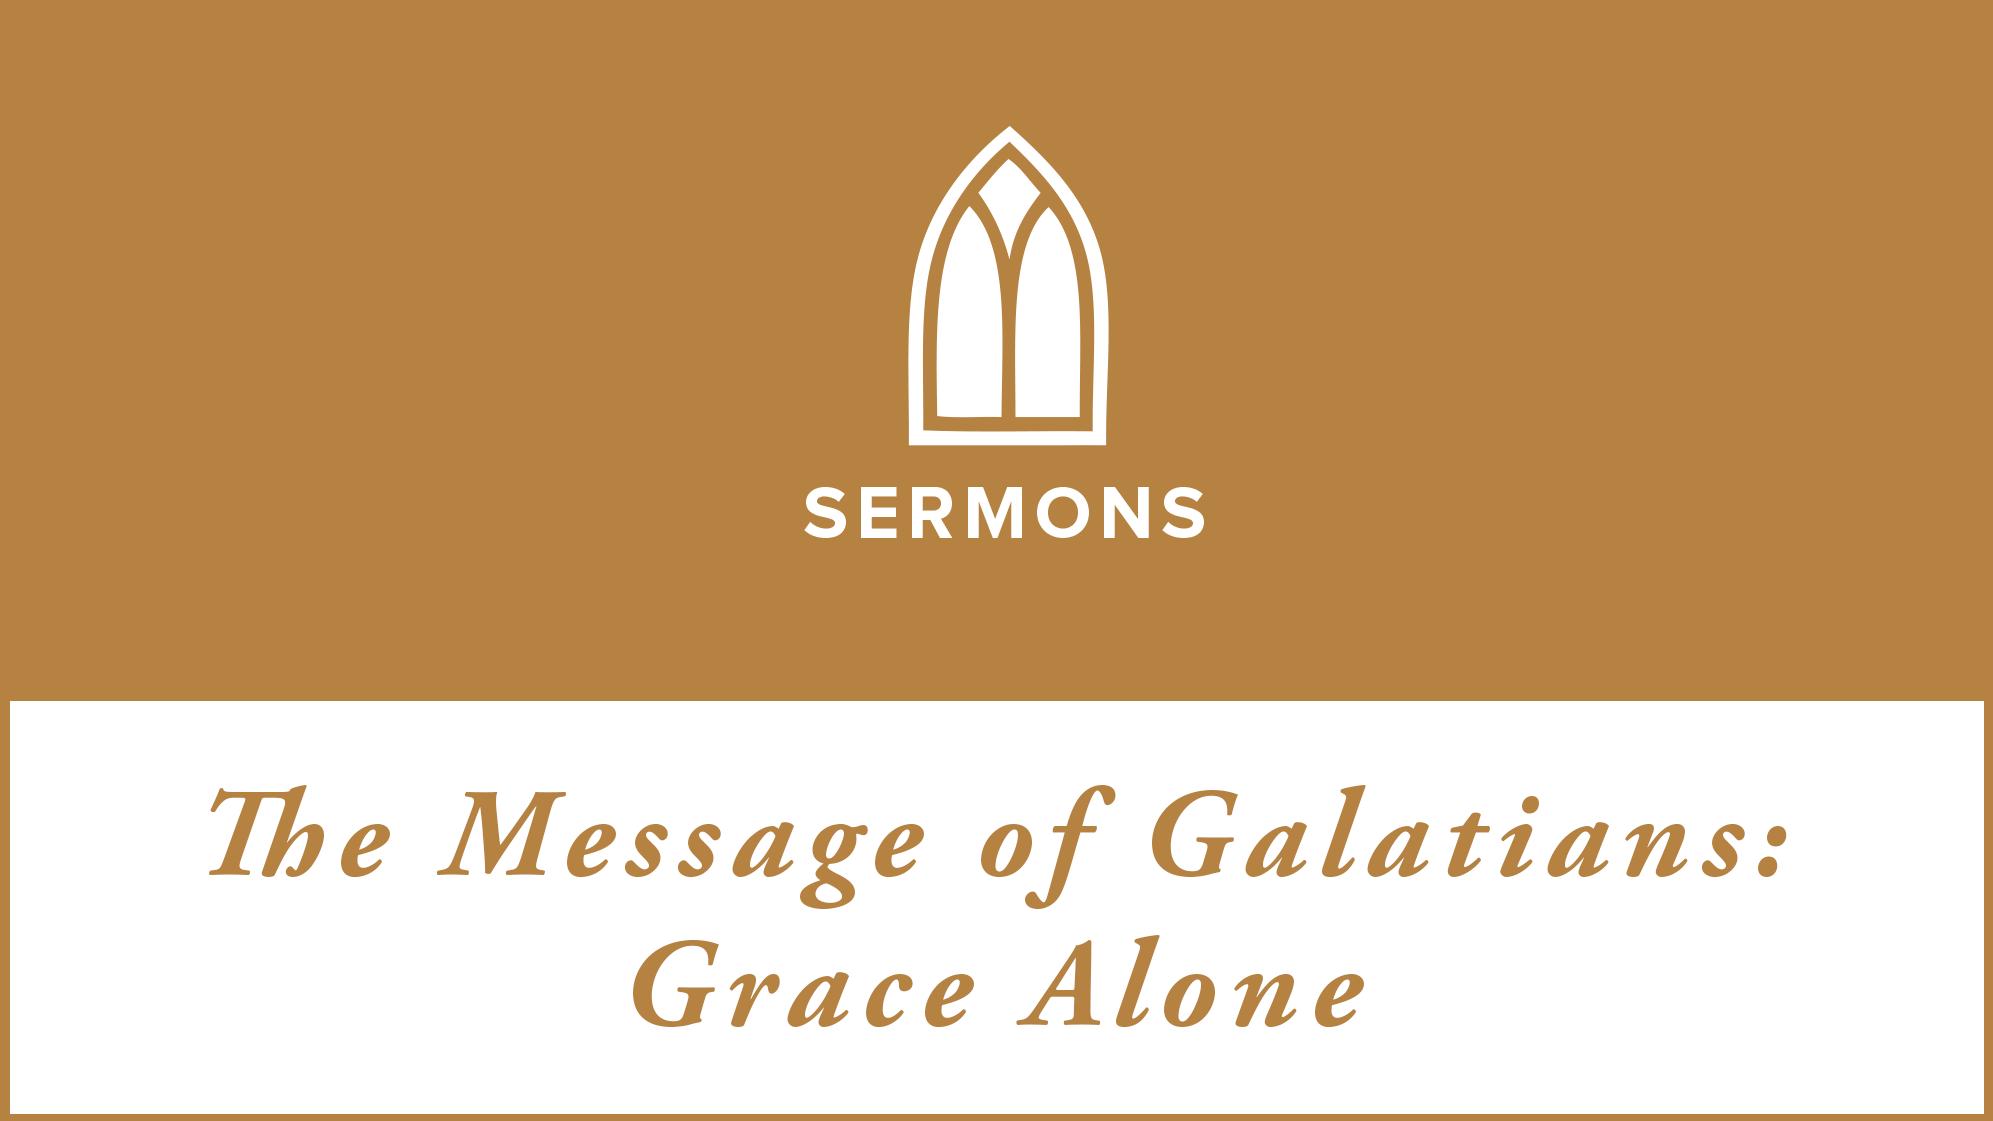 Galatians-Grace-Alone-16x9.png